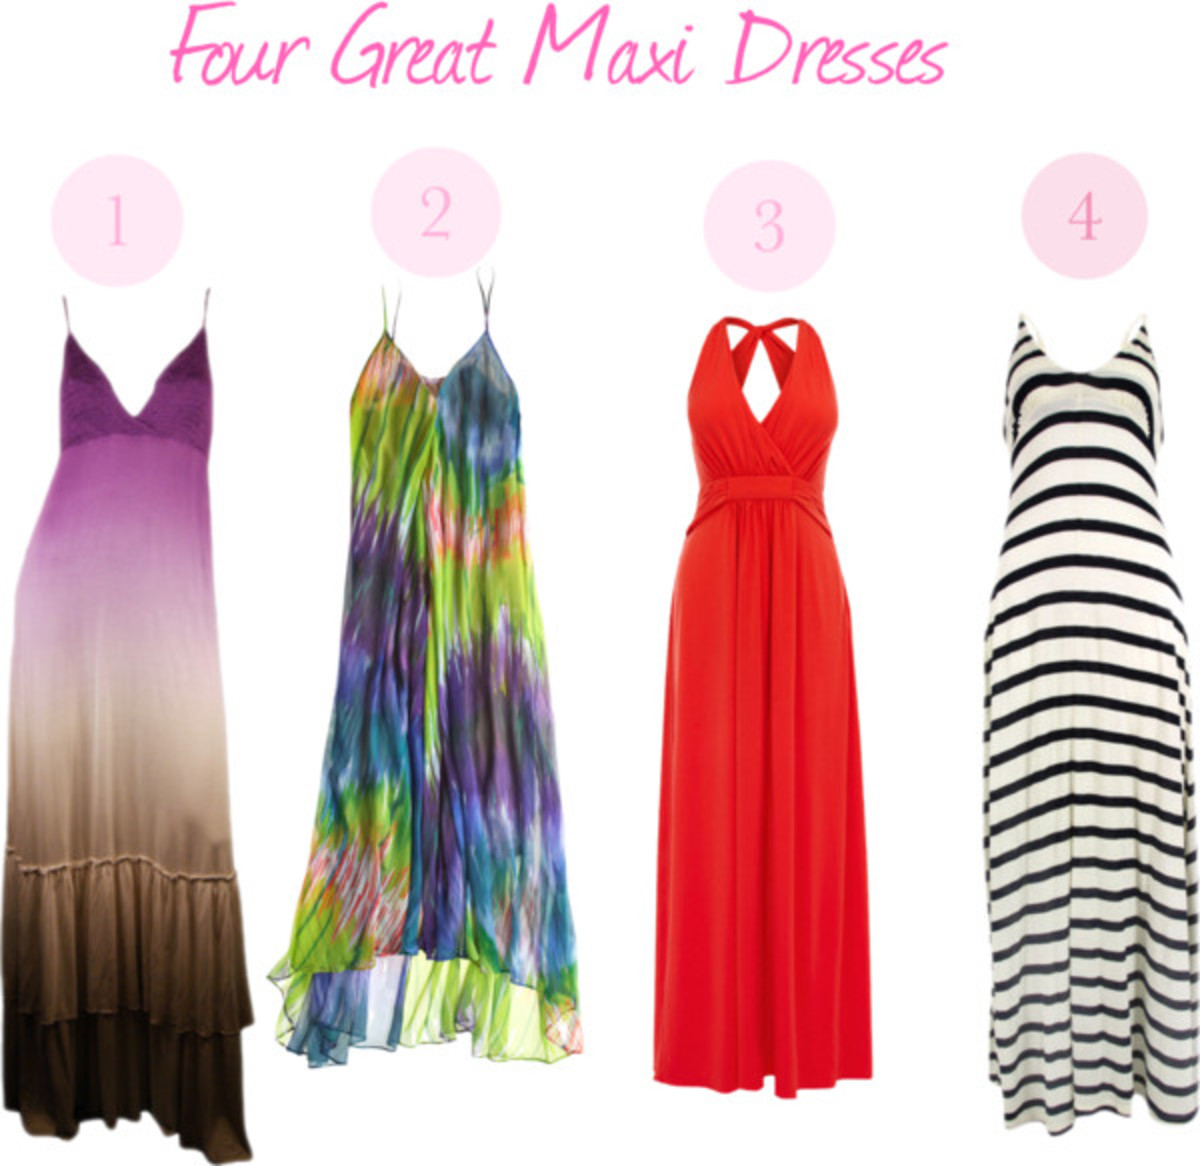 Four Great Maxi Dresses